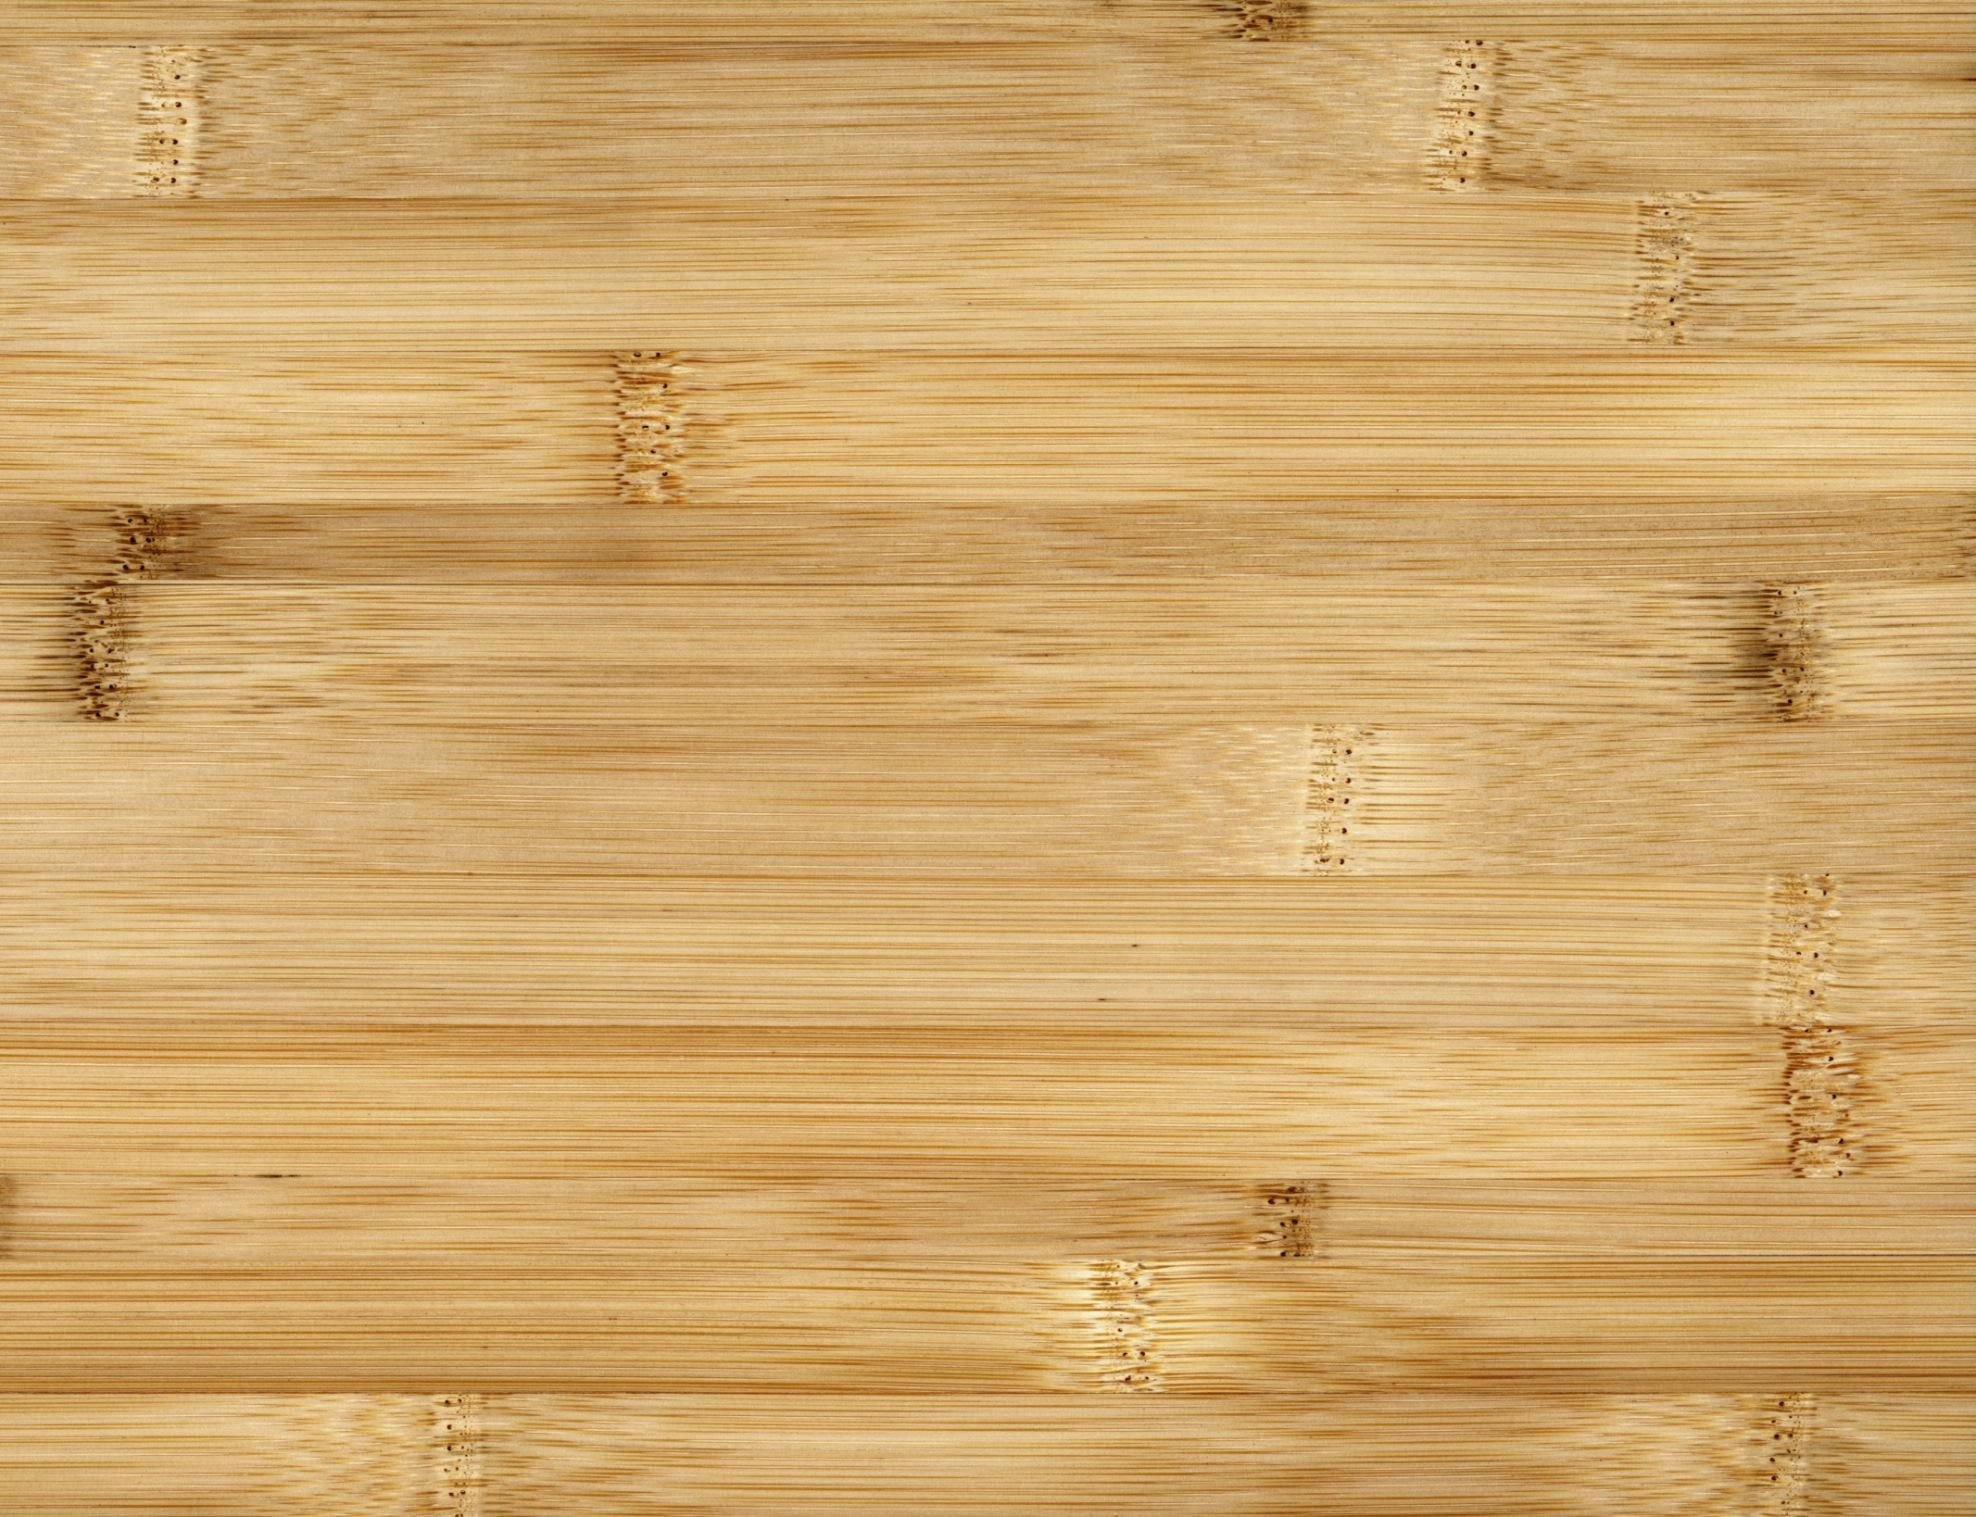 13 Elegant How To Make Hardwood Floors Shine Unique Flooring Ideas